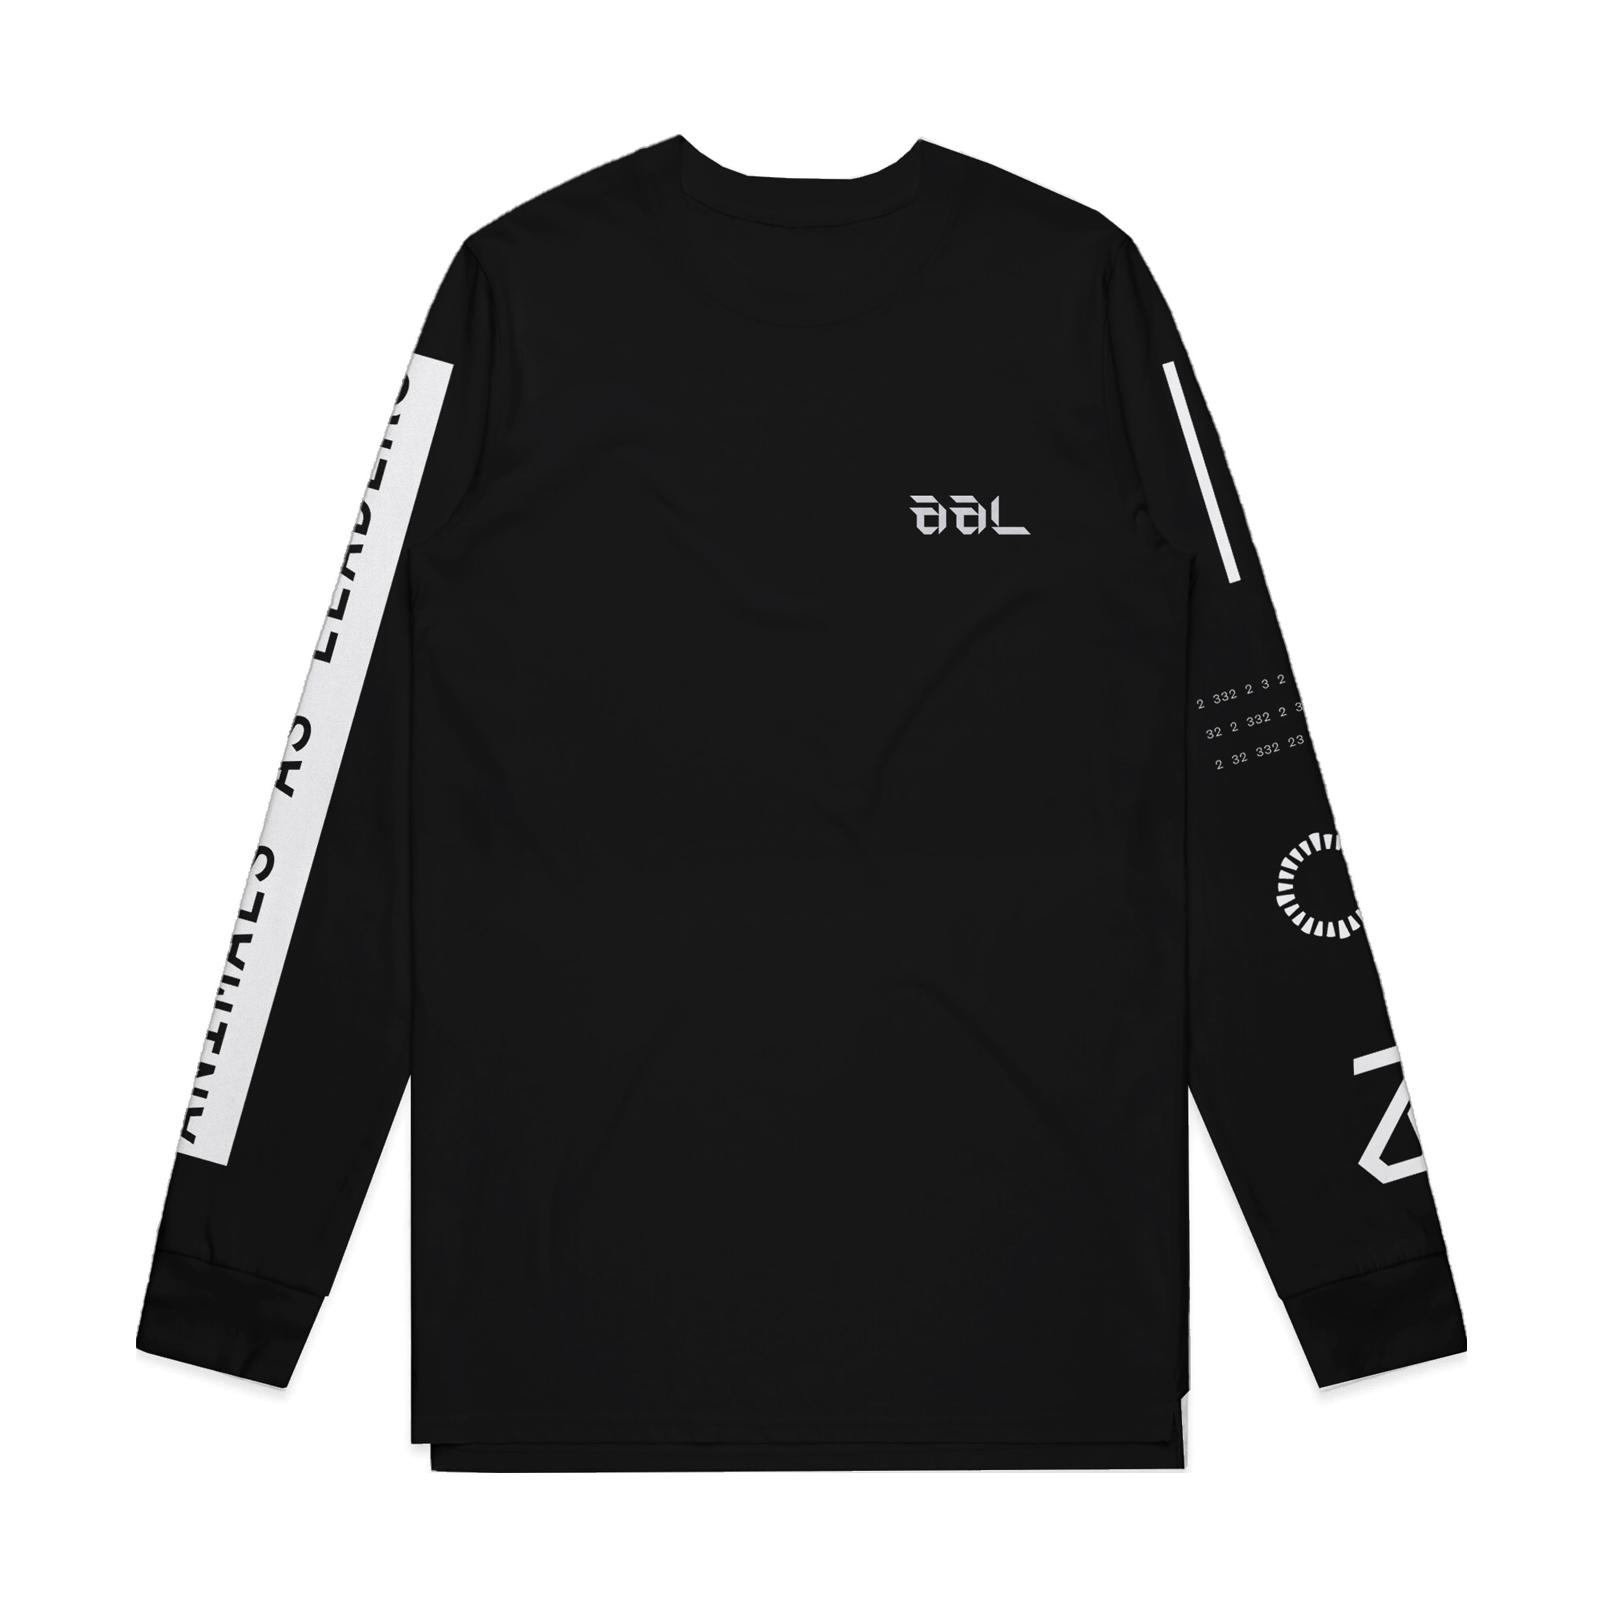 Monomyth Black LS 2